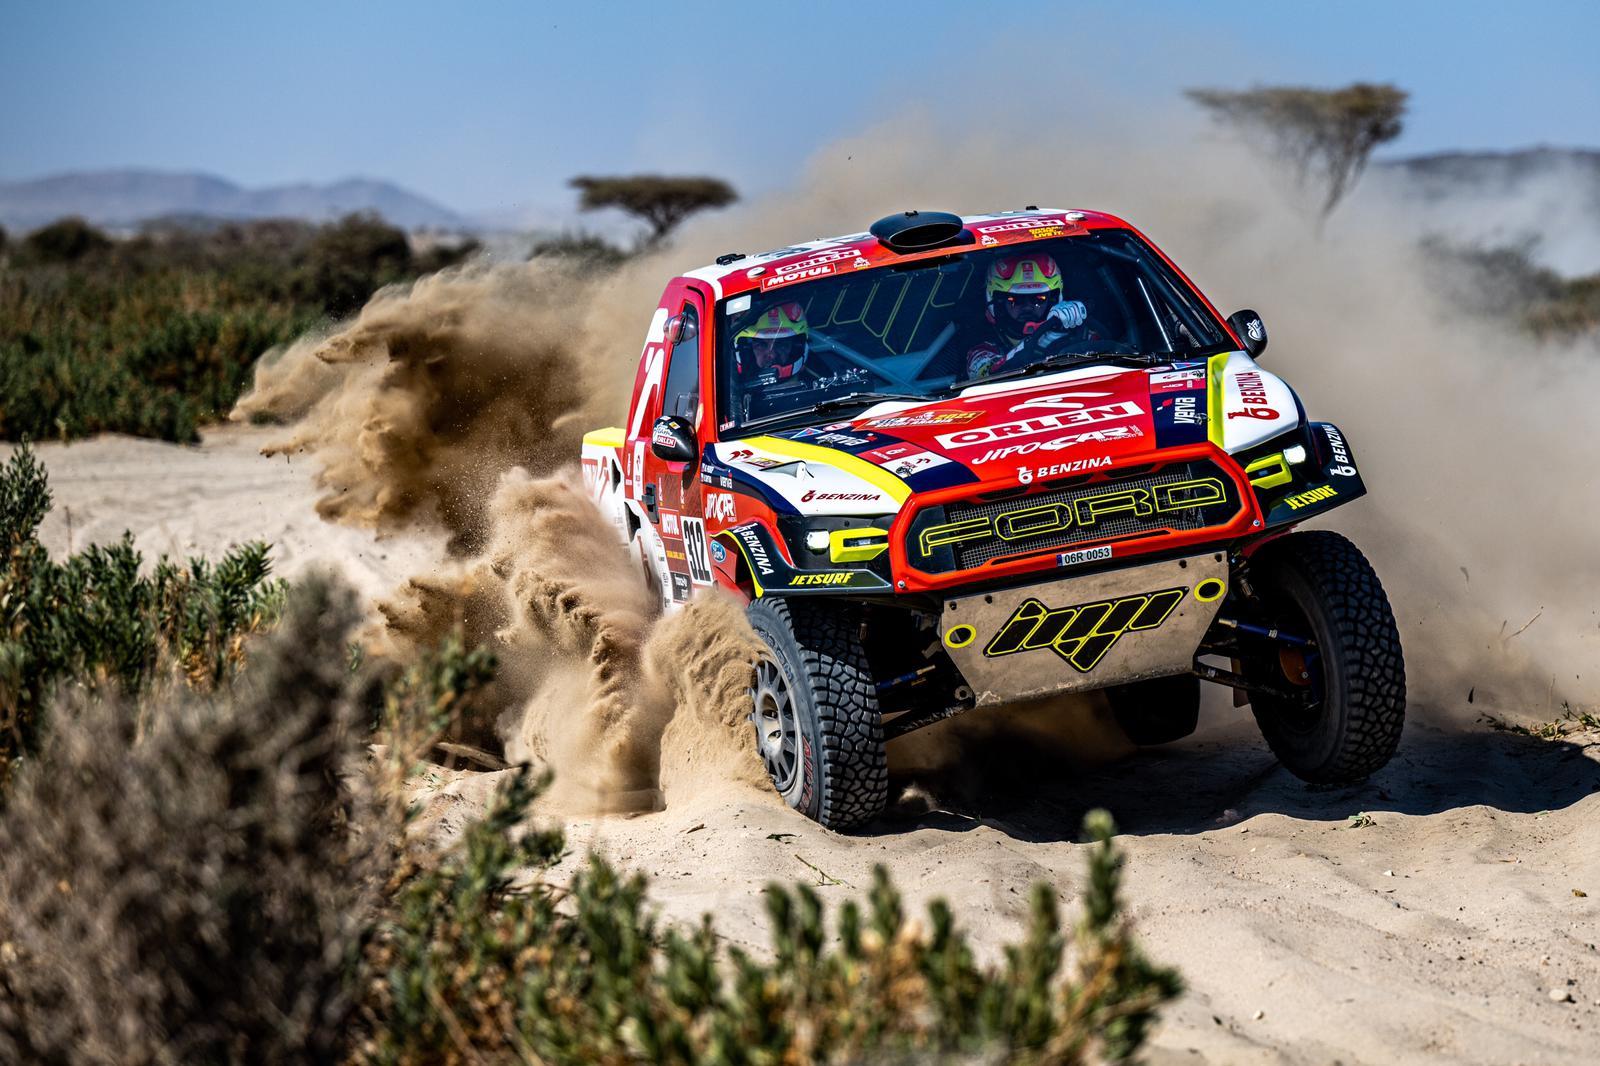 Martin Prokop/Viktor Chytka Dakar 2020